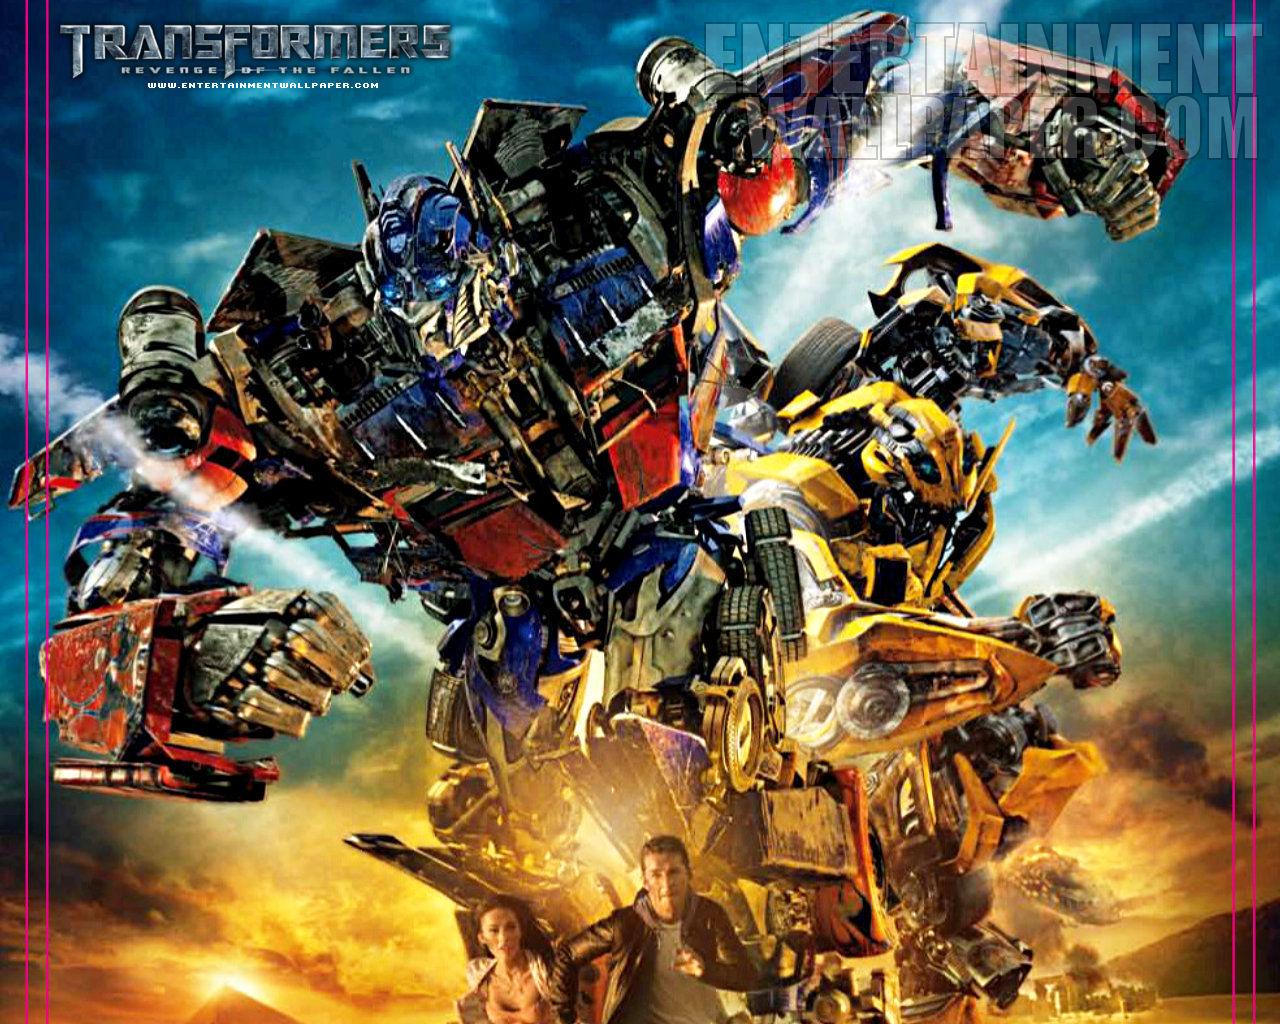 Download Transformers Wallpapers For Desktop 1280x1024